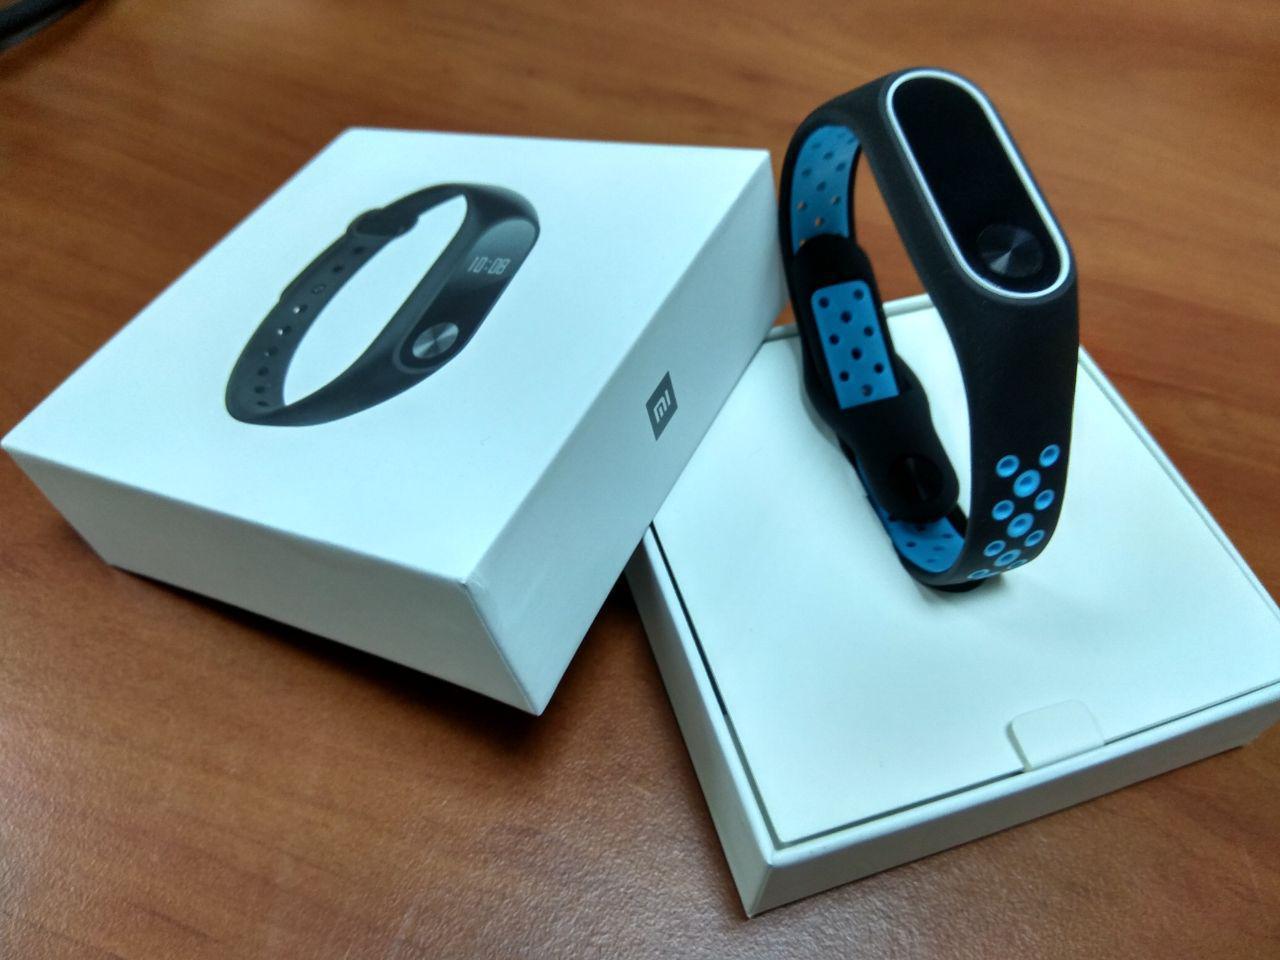 Фитнес-браслет Xiaomi Mi Band 2 (Black) ОРИГИНАЛ + ремешок (Black/blue Nike) Гарантия 3 месяца